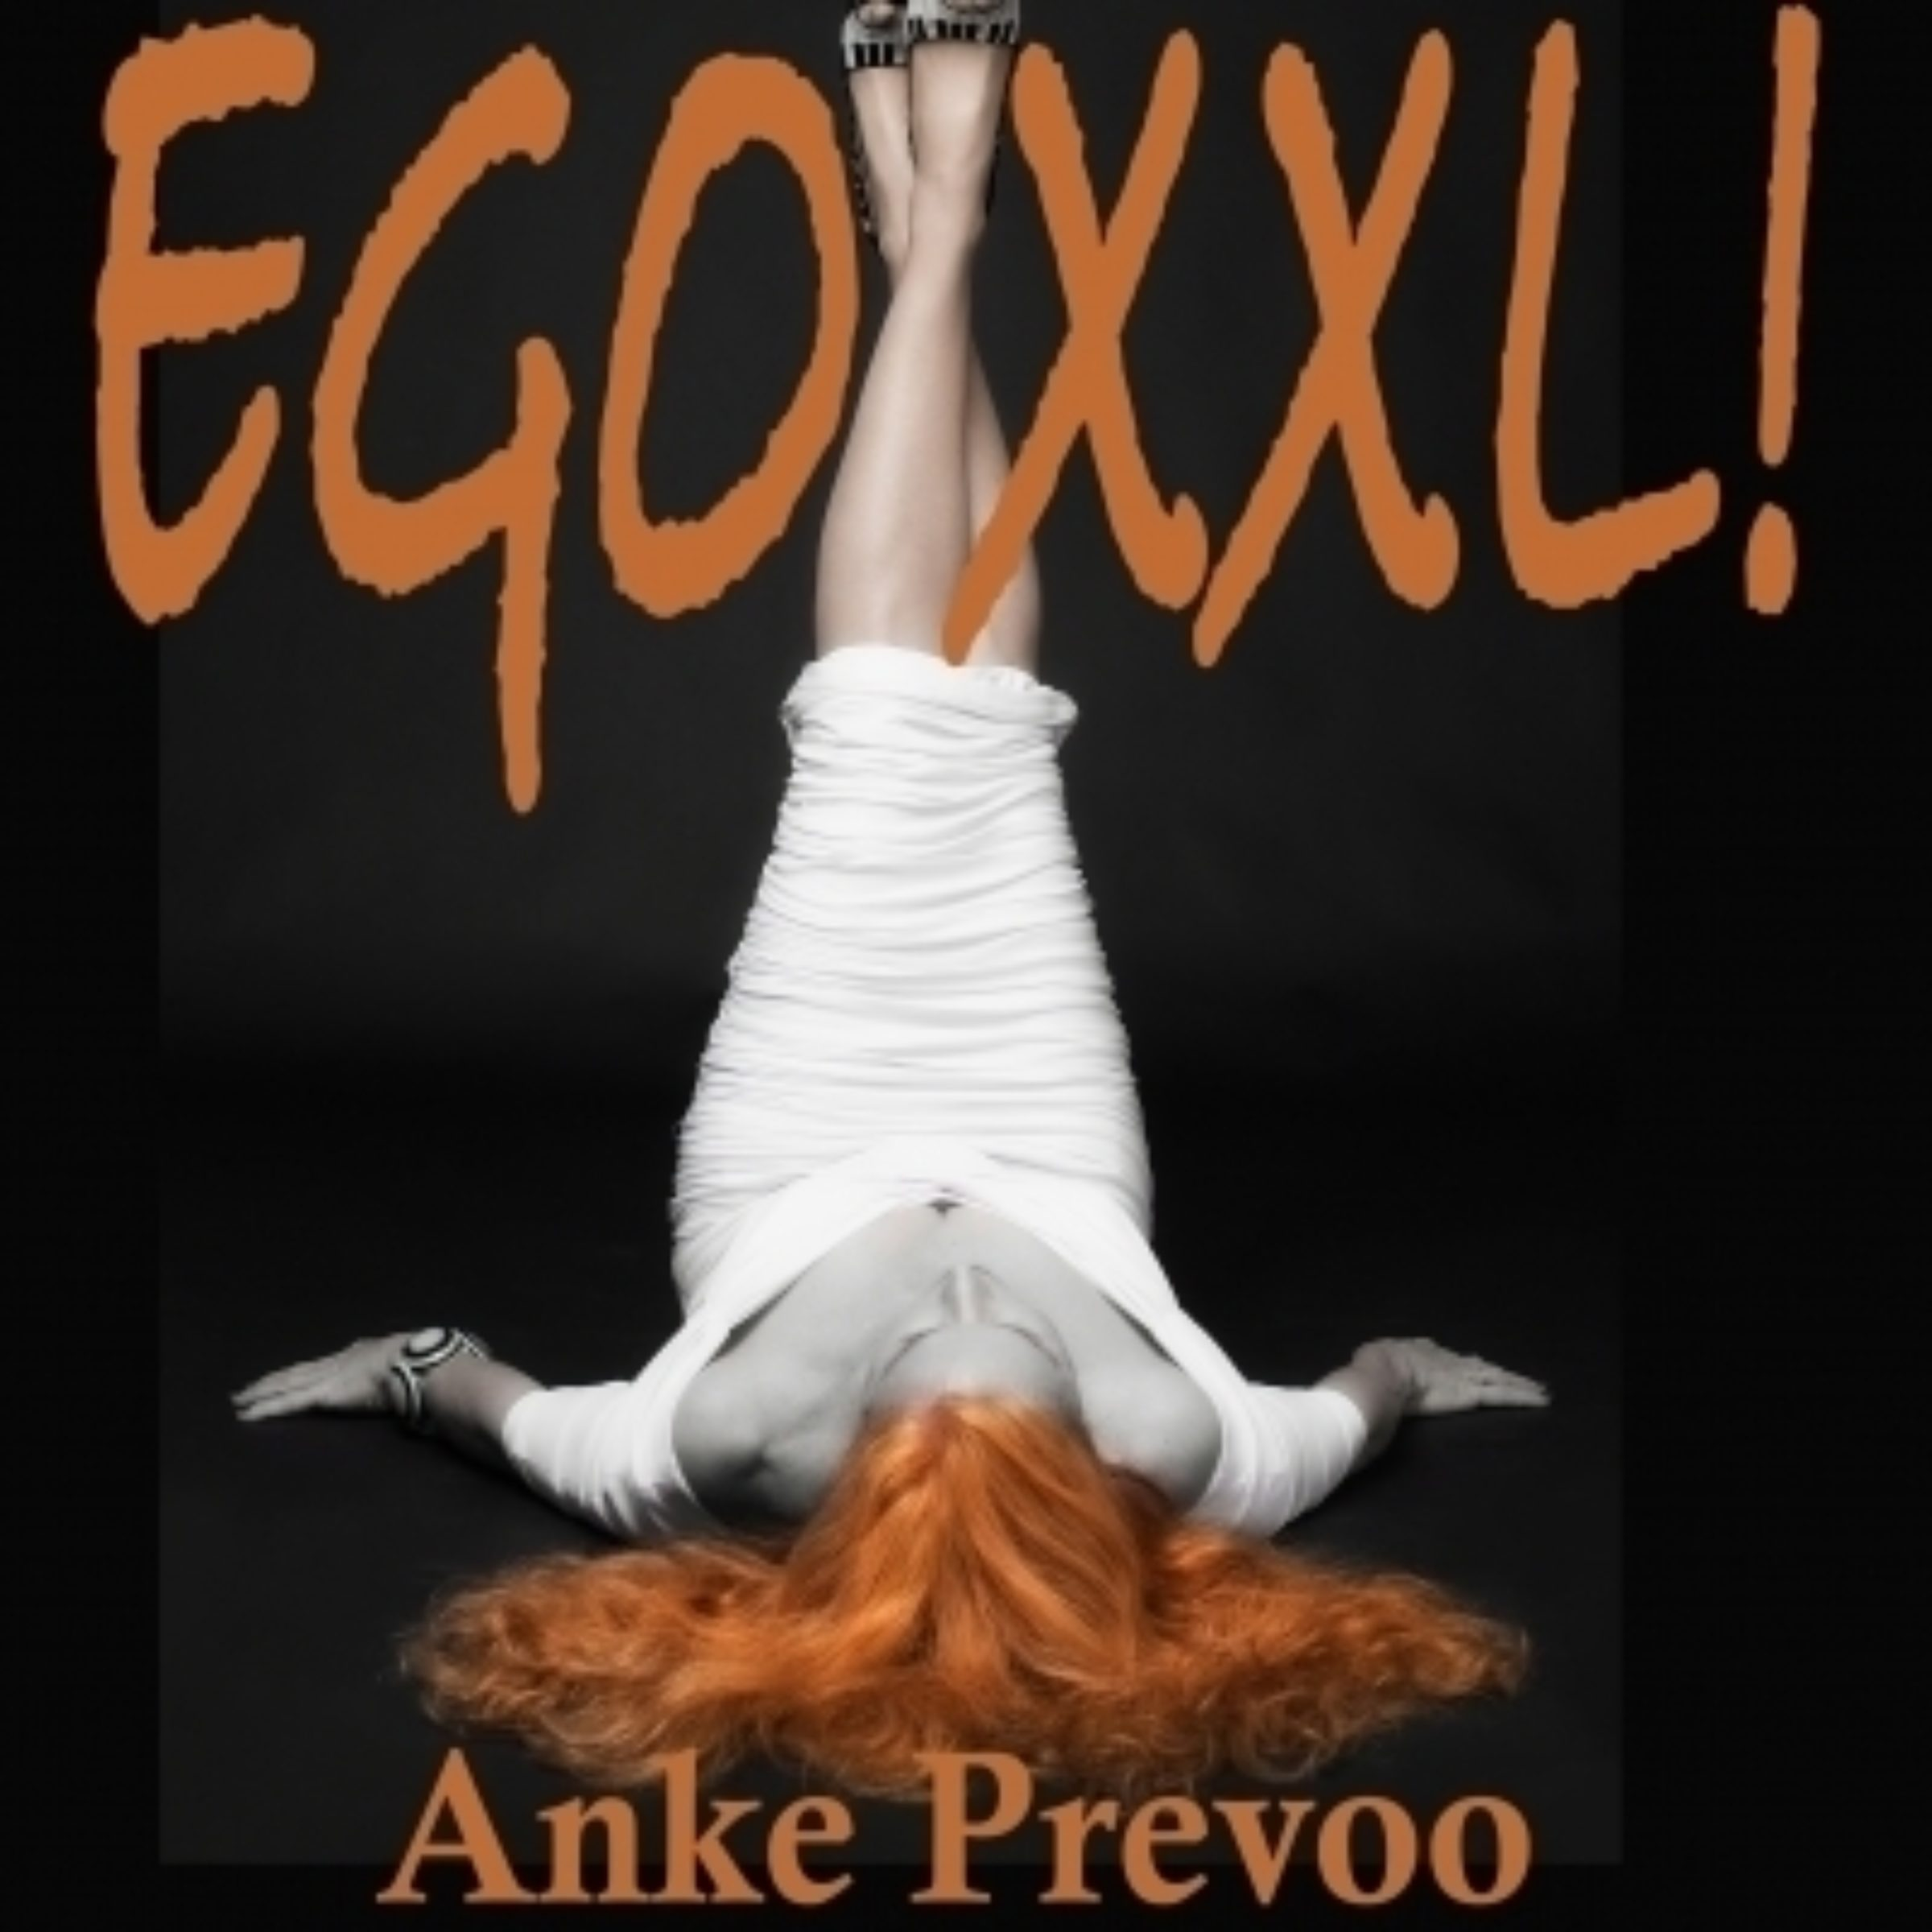 400x400 poster anke theaters web 35i1y1pjm7